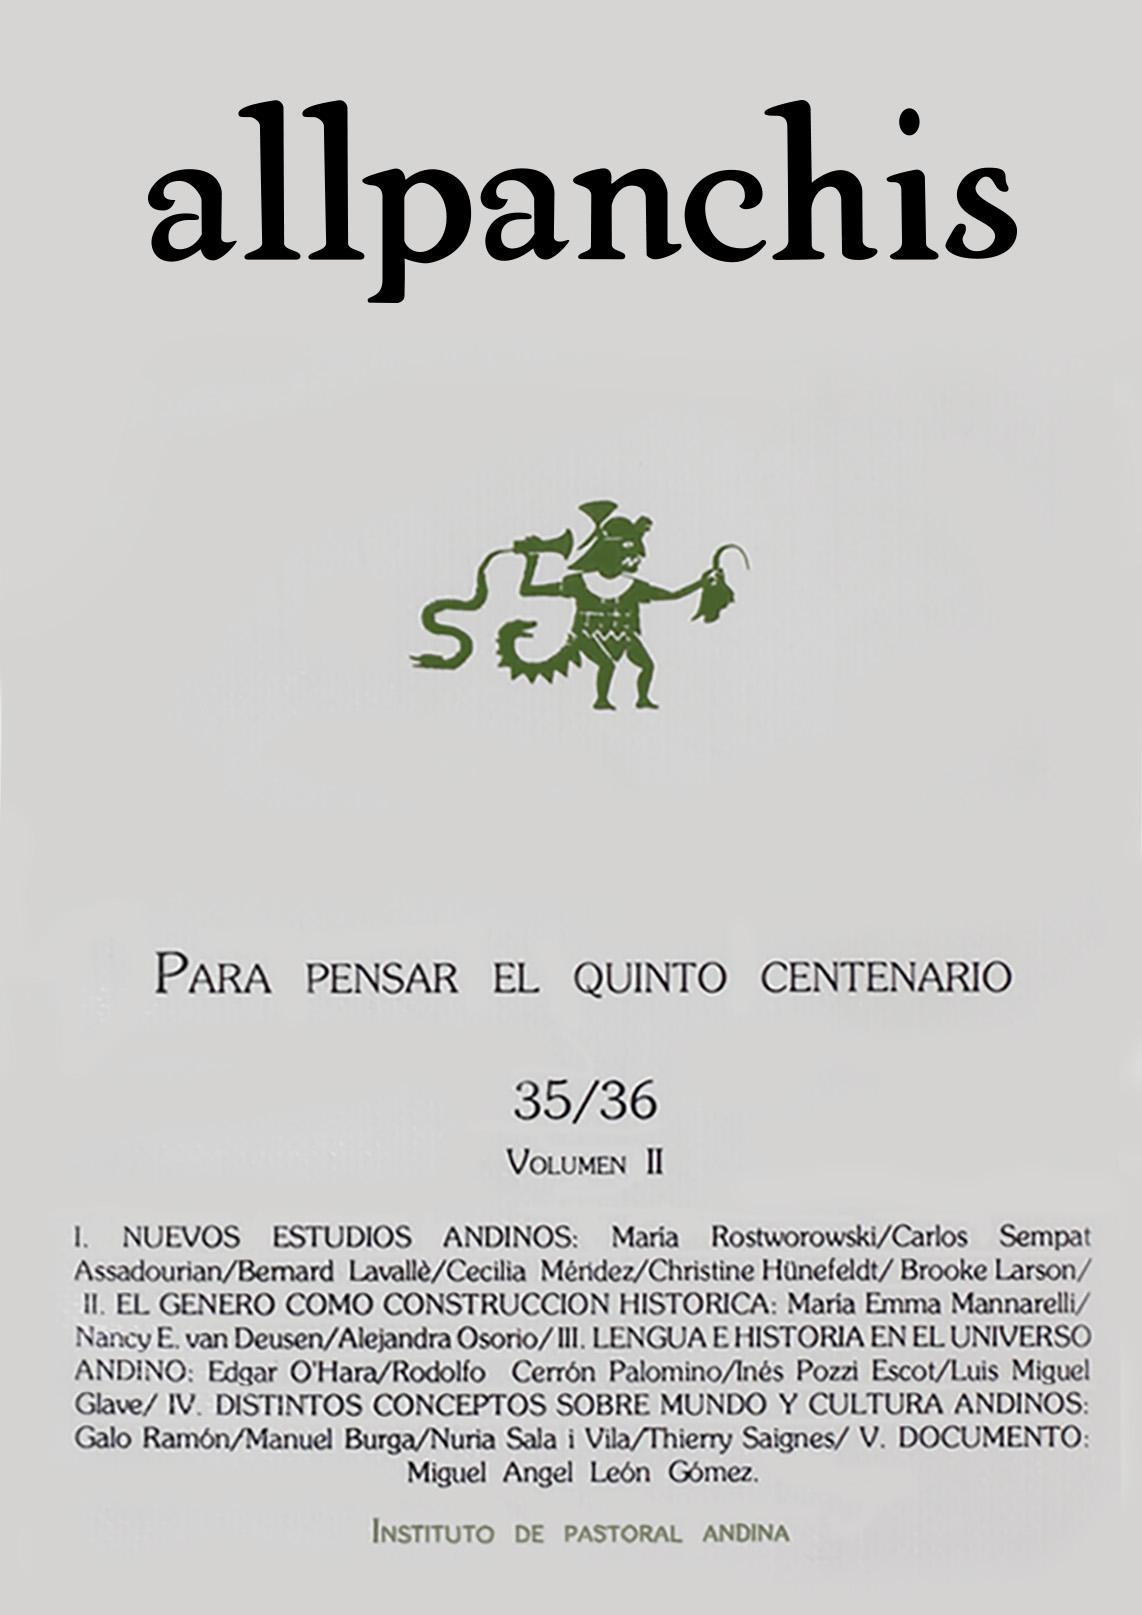 Allpanchis 35/36 (volumen II)